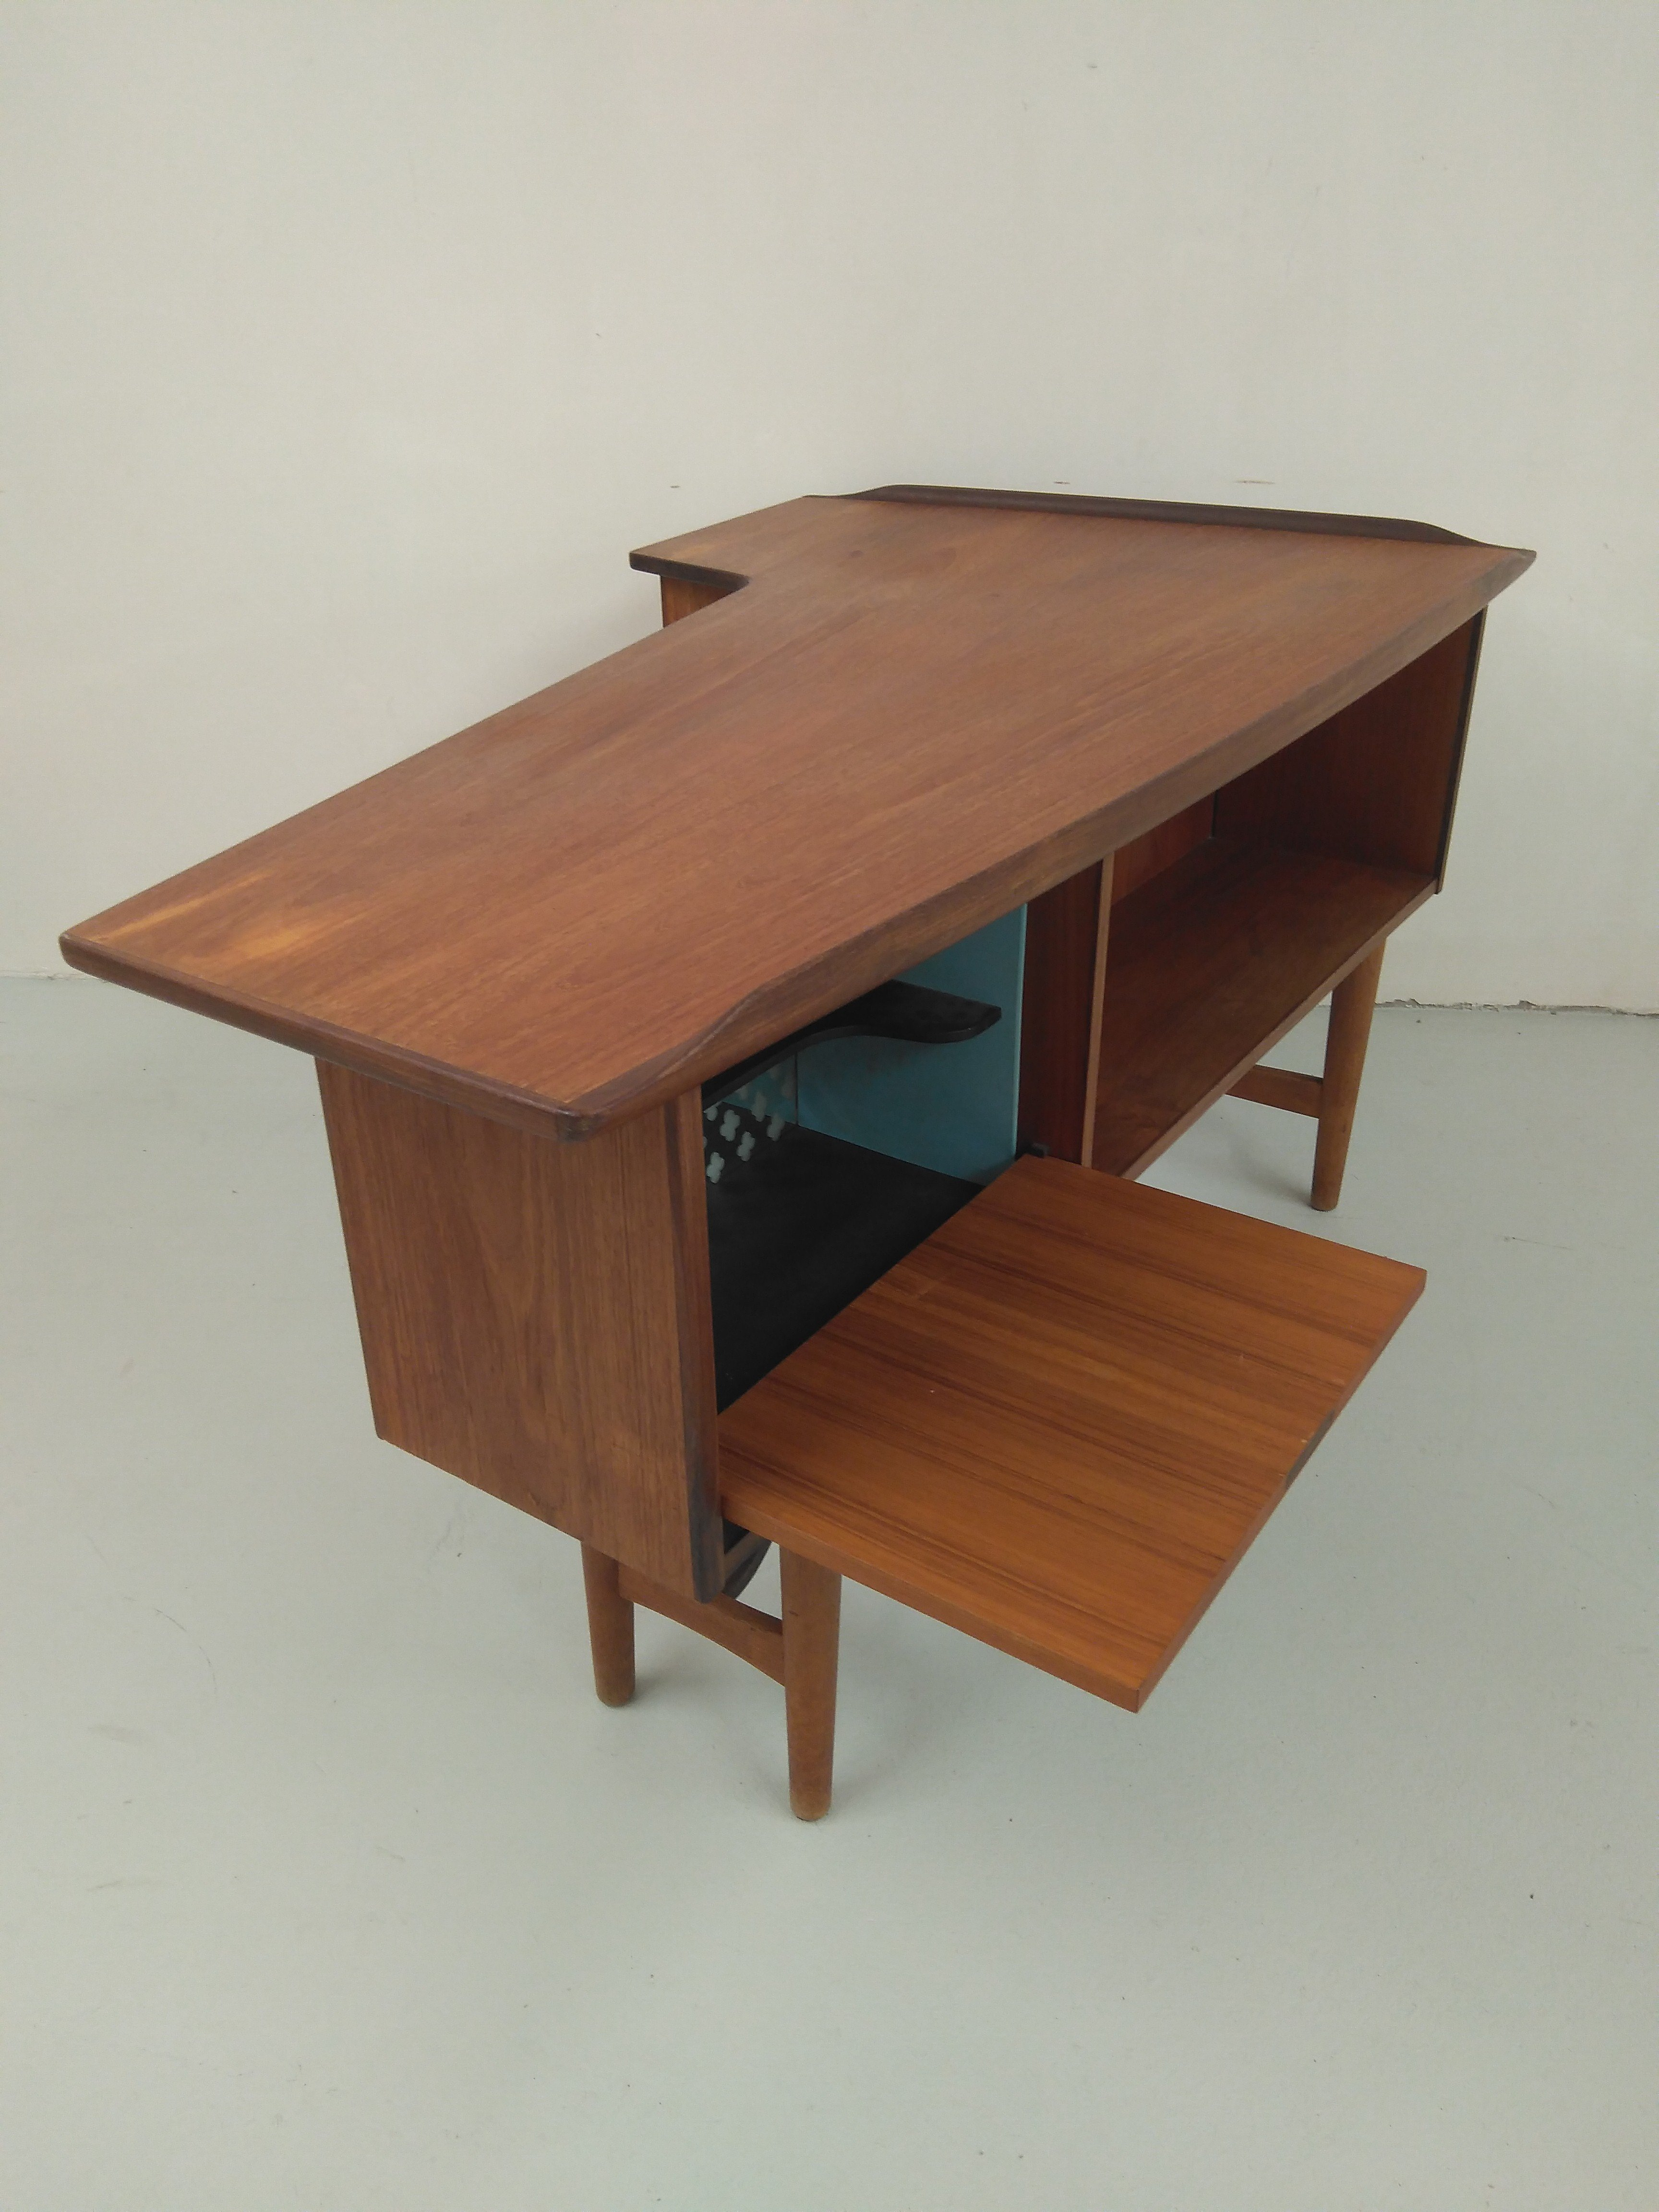 Boomerang Tv Meubel.El Vinta Boomerang Desk Decoration Furniture Vintage